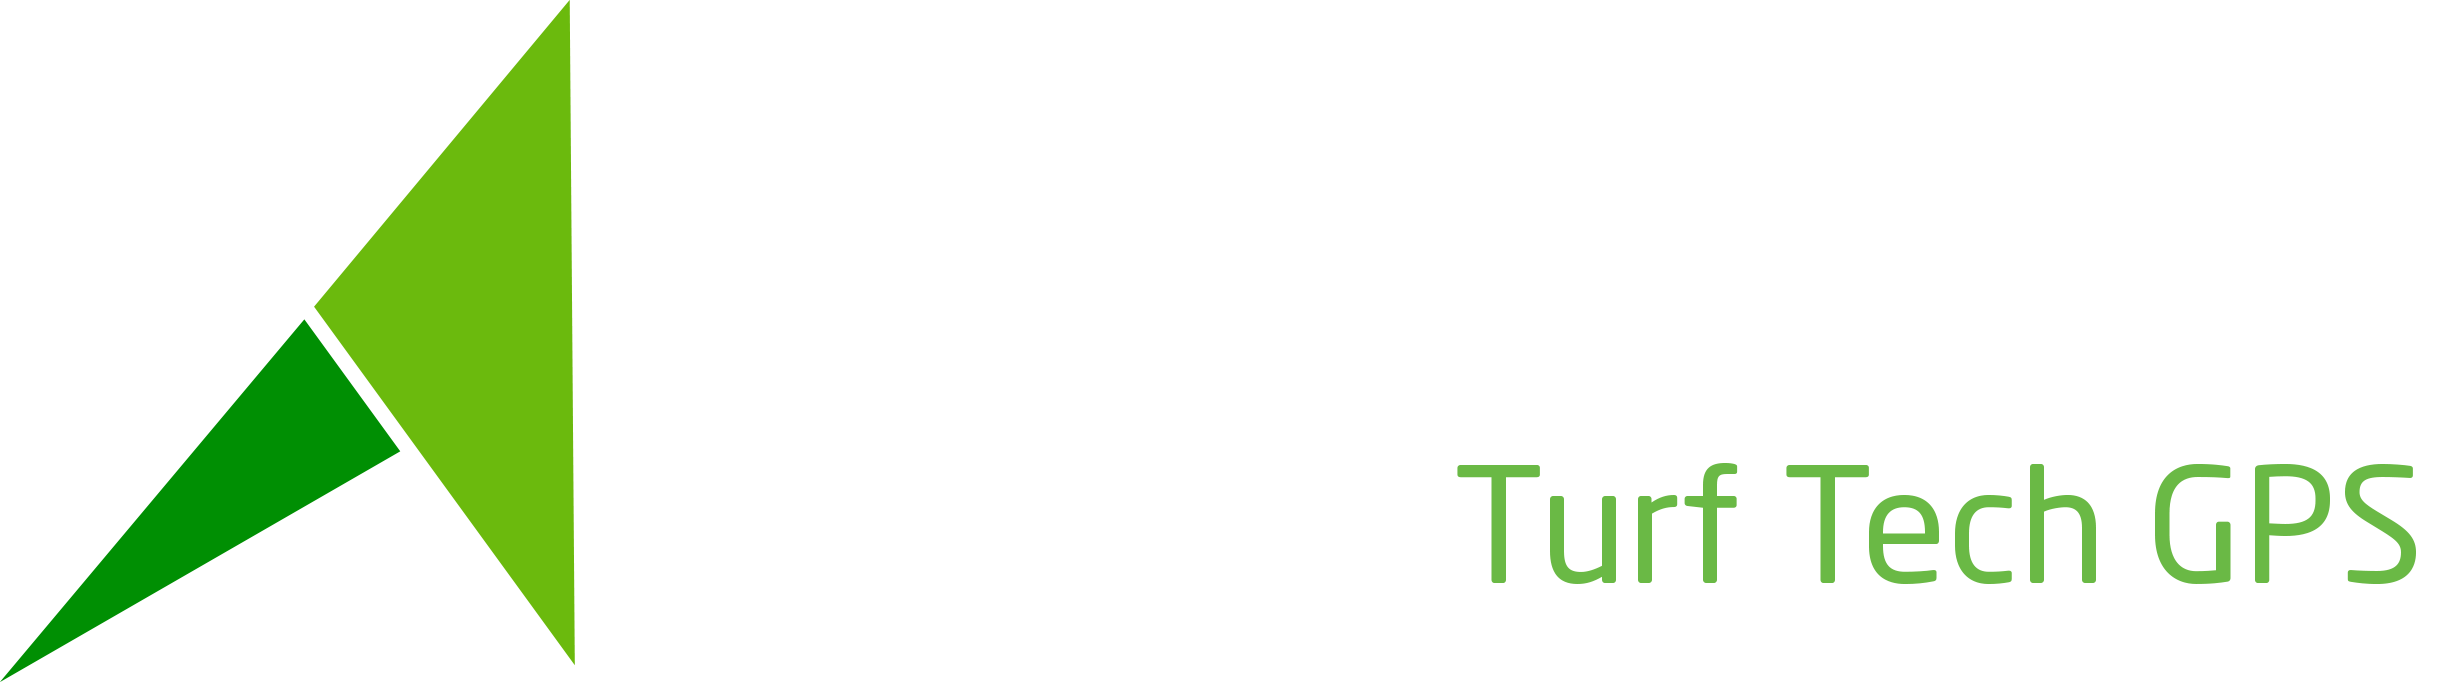 Traqnology_turftech_white_logo